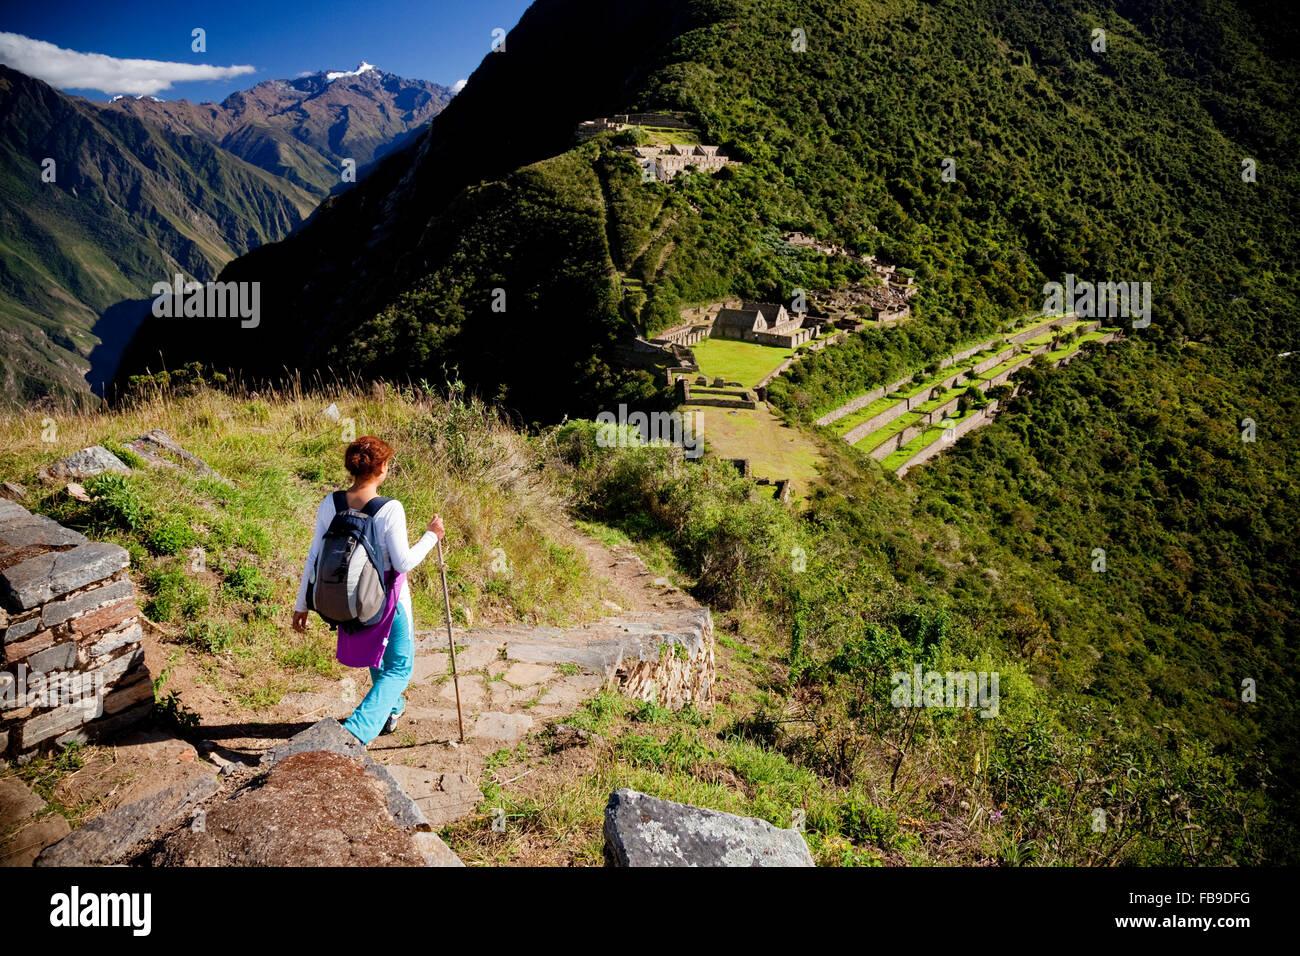 Hiker at Choquequirao (Cradle of Gold), Peru. - Stock Image